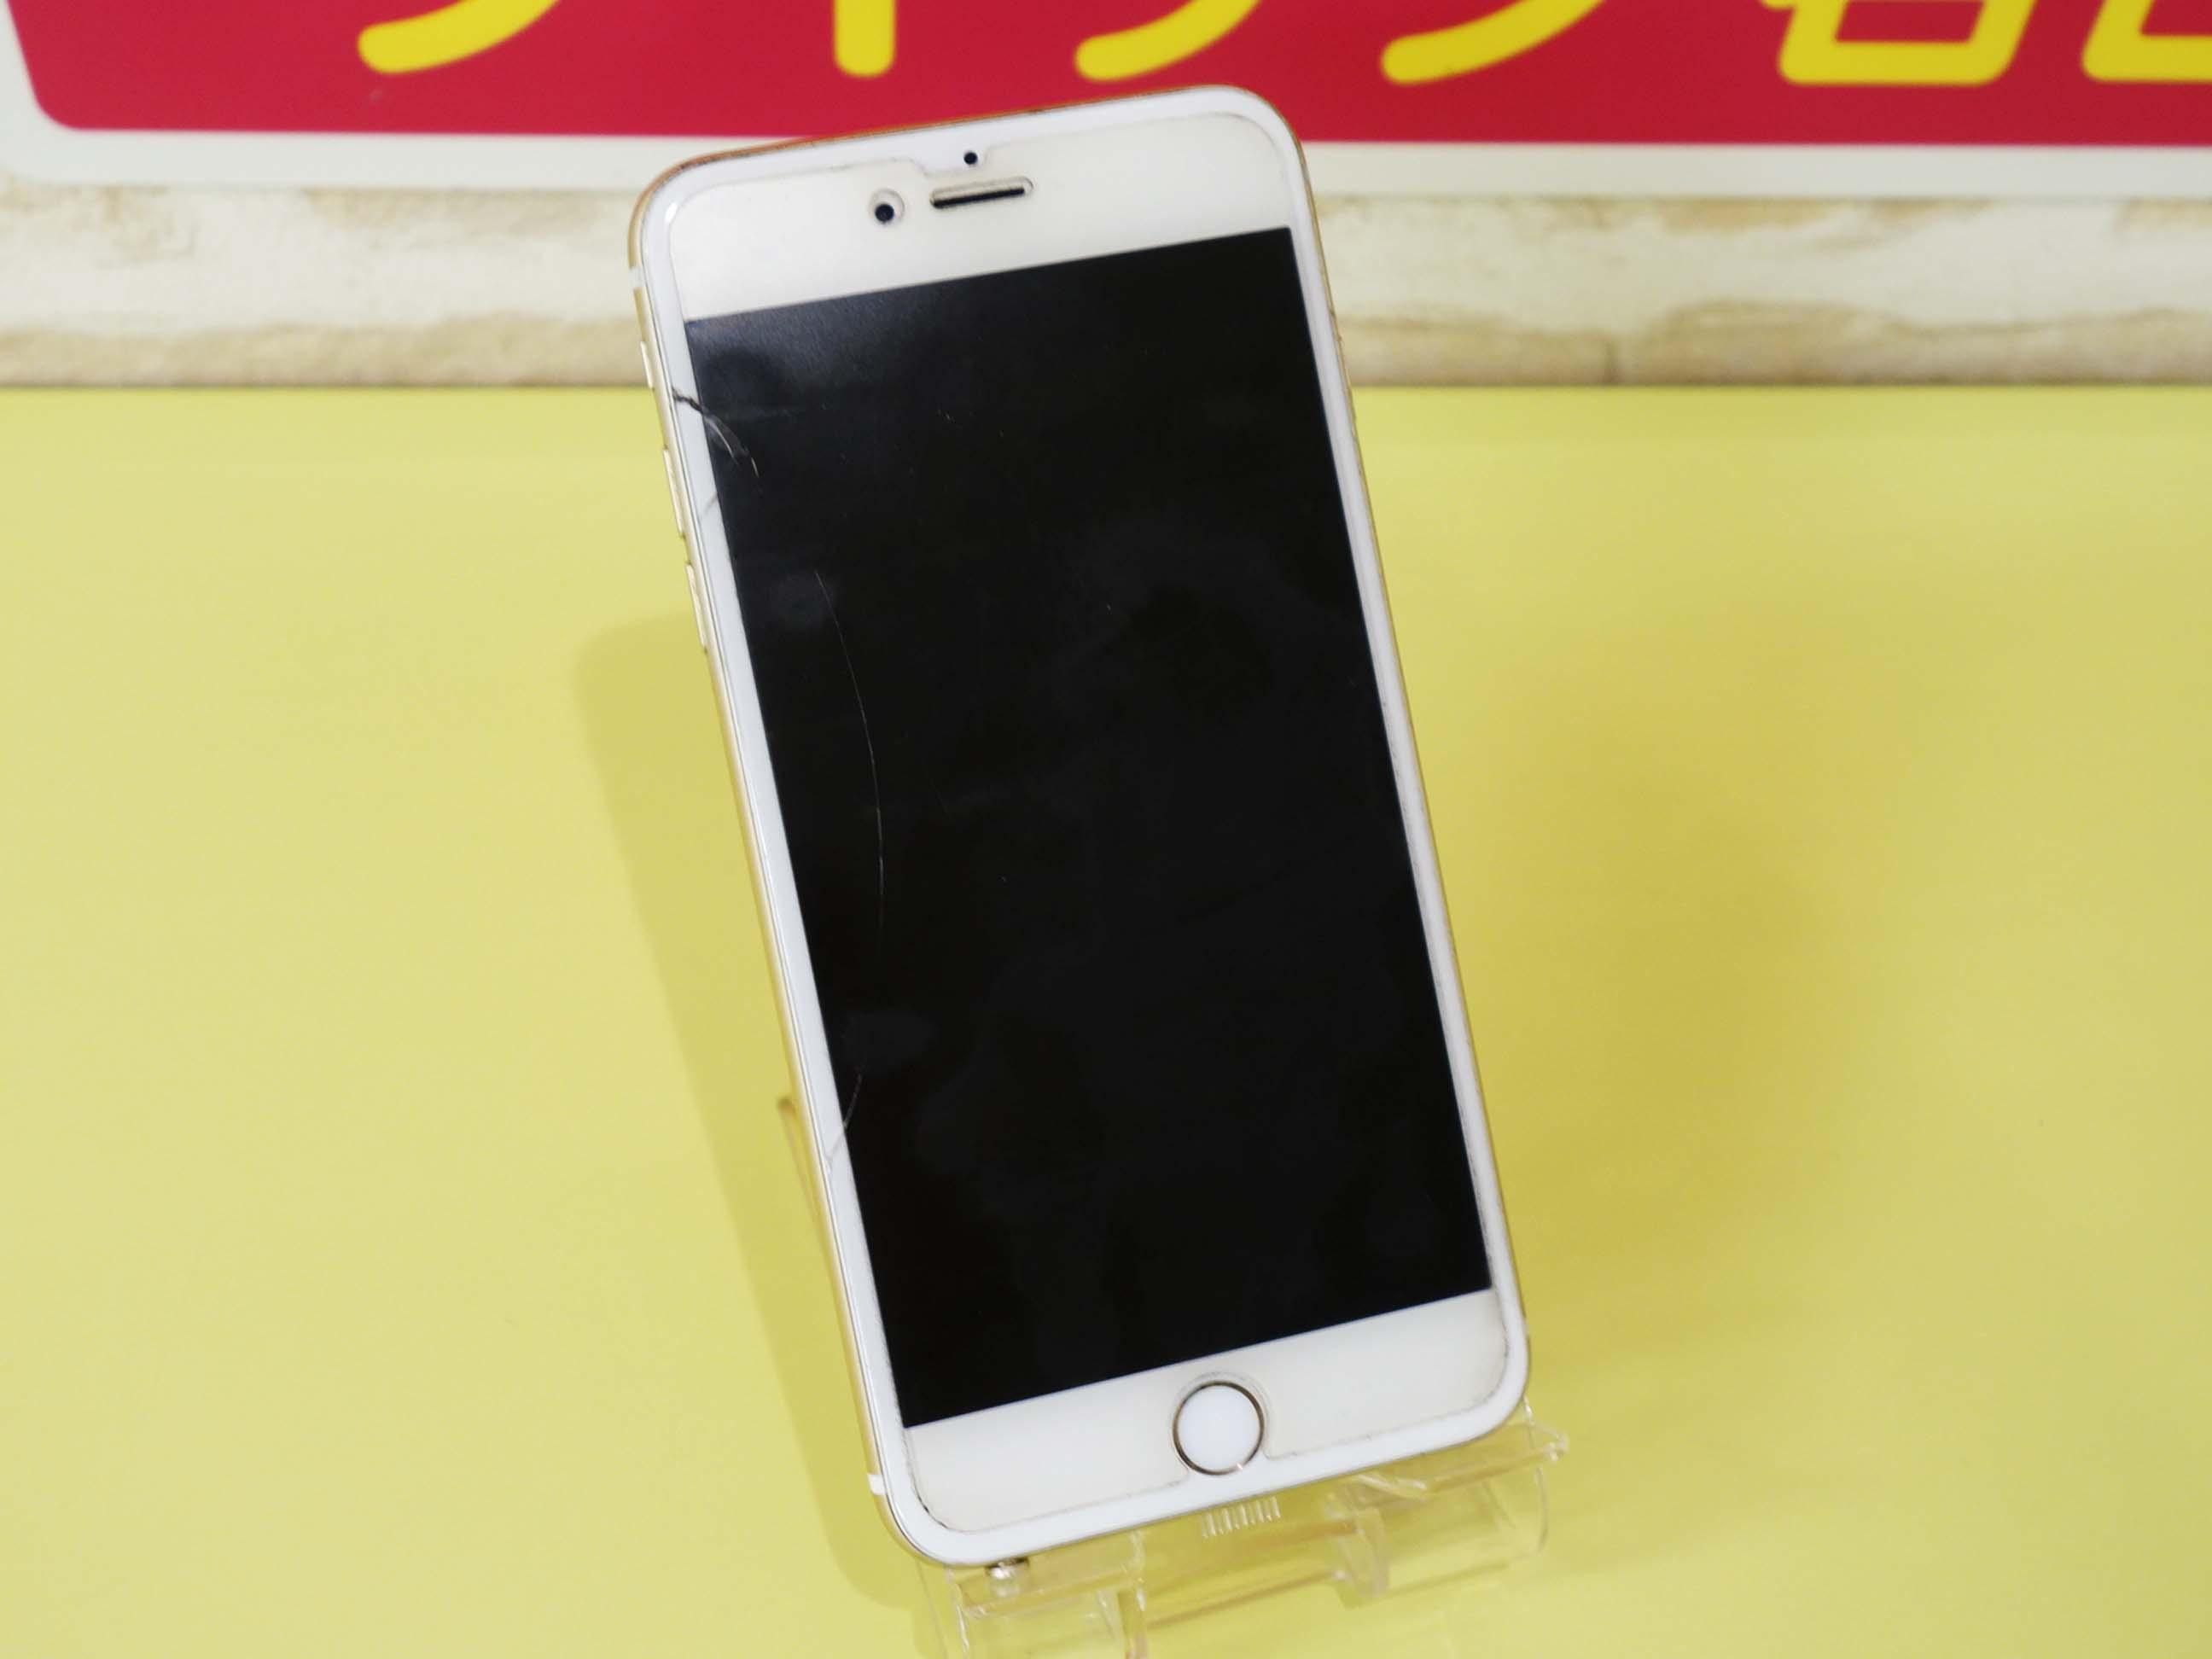 iPhone6 Plusのドックコネクター修理で名古屋市内からご来店!アイフォン修理のクイック名古屋